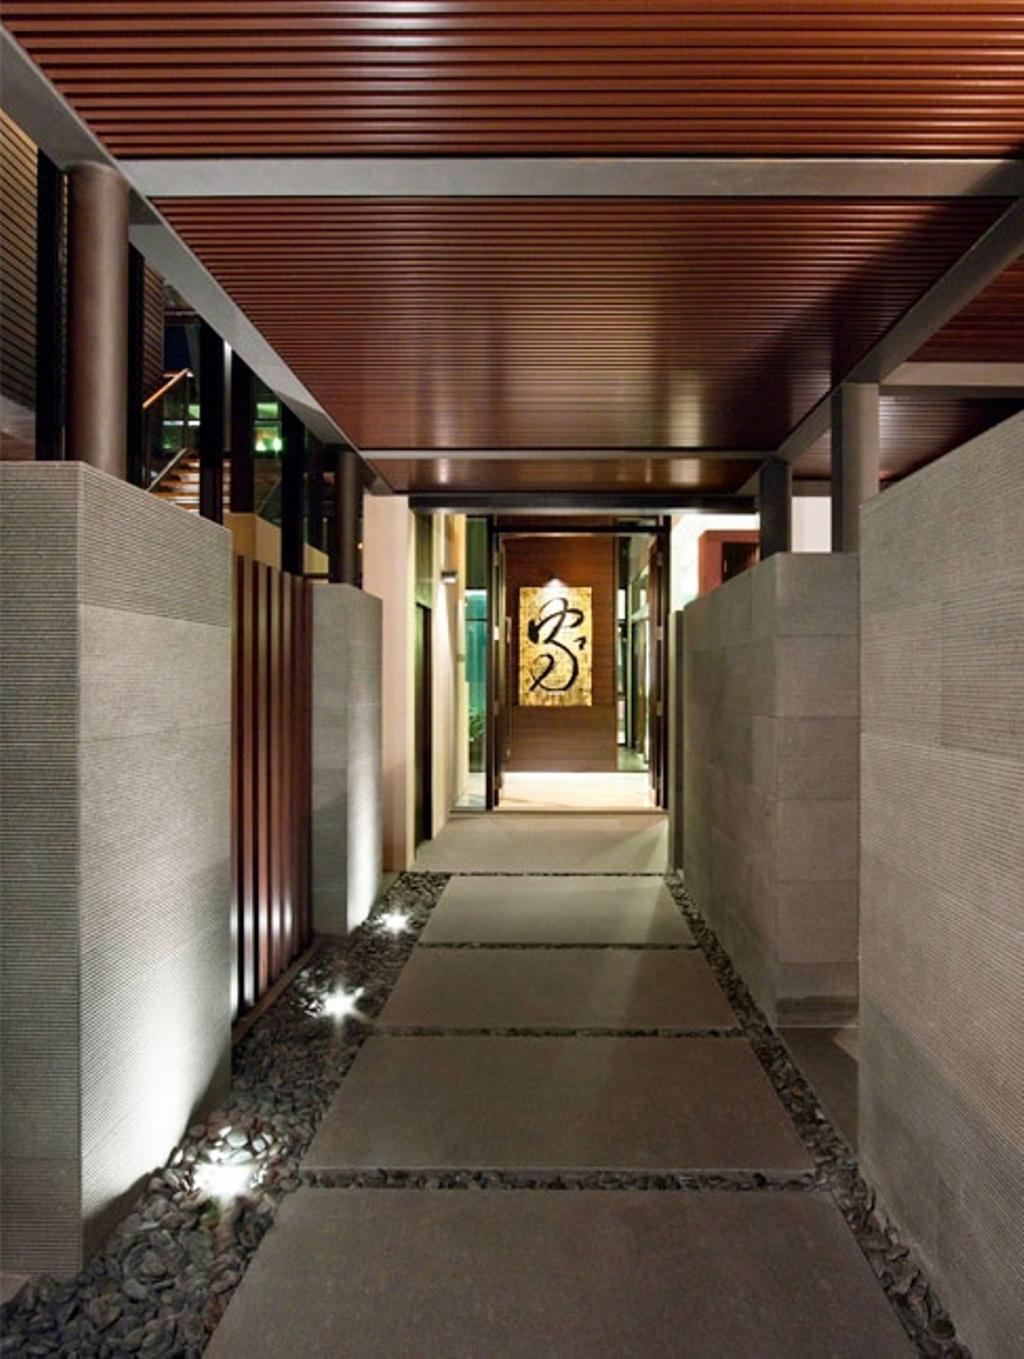 Traditional, Landed, Frankel Walk, Architect, Timur Designs, Corridor